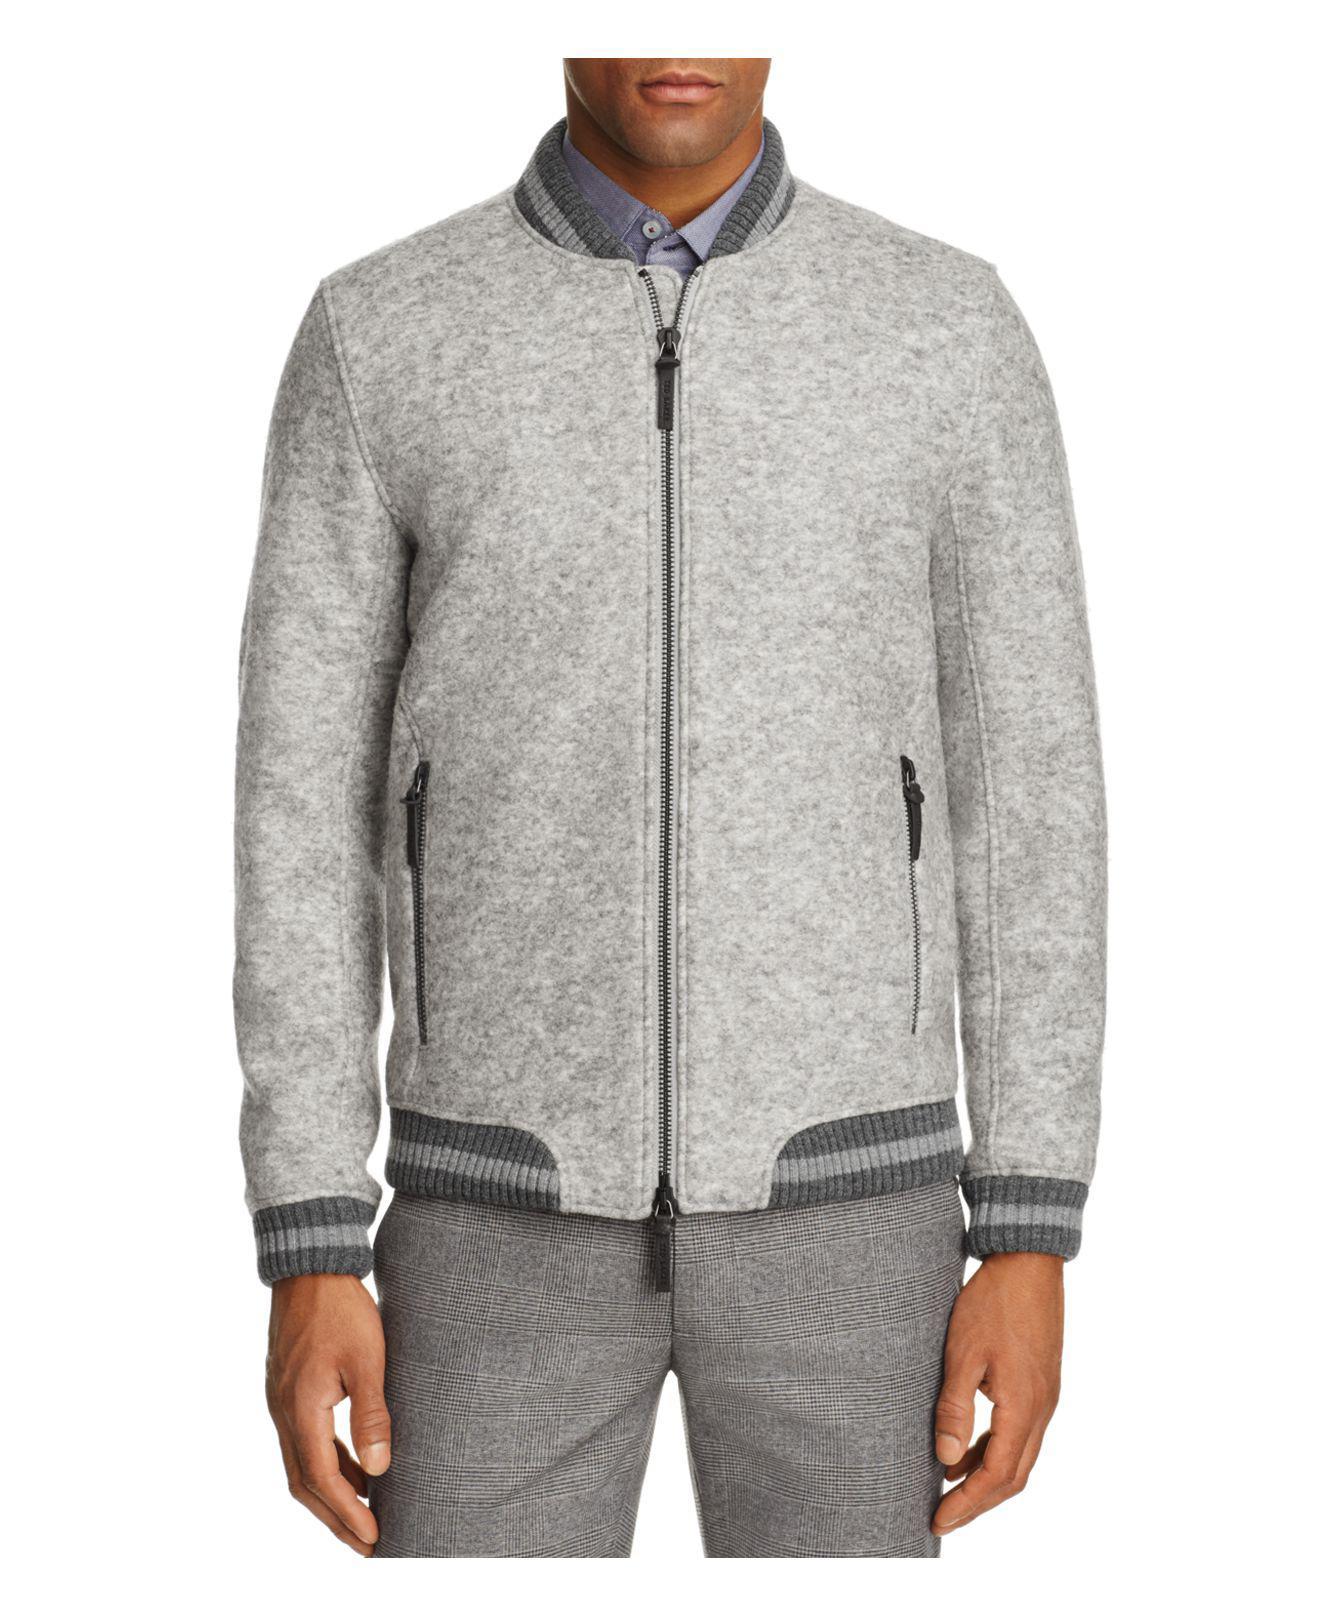 259dec731 Lyst - Ted Baker Freddy Wool Bomber Jacket in Gray for Men